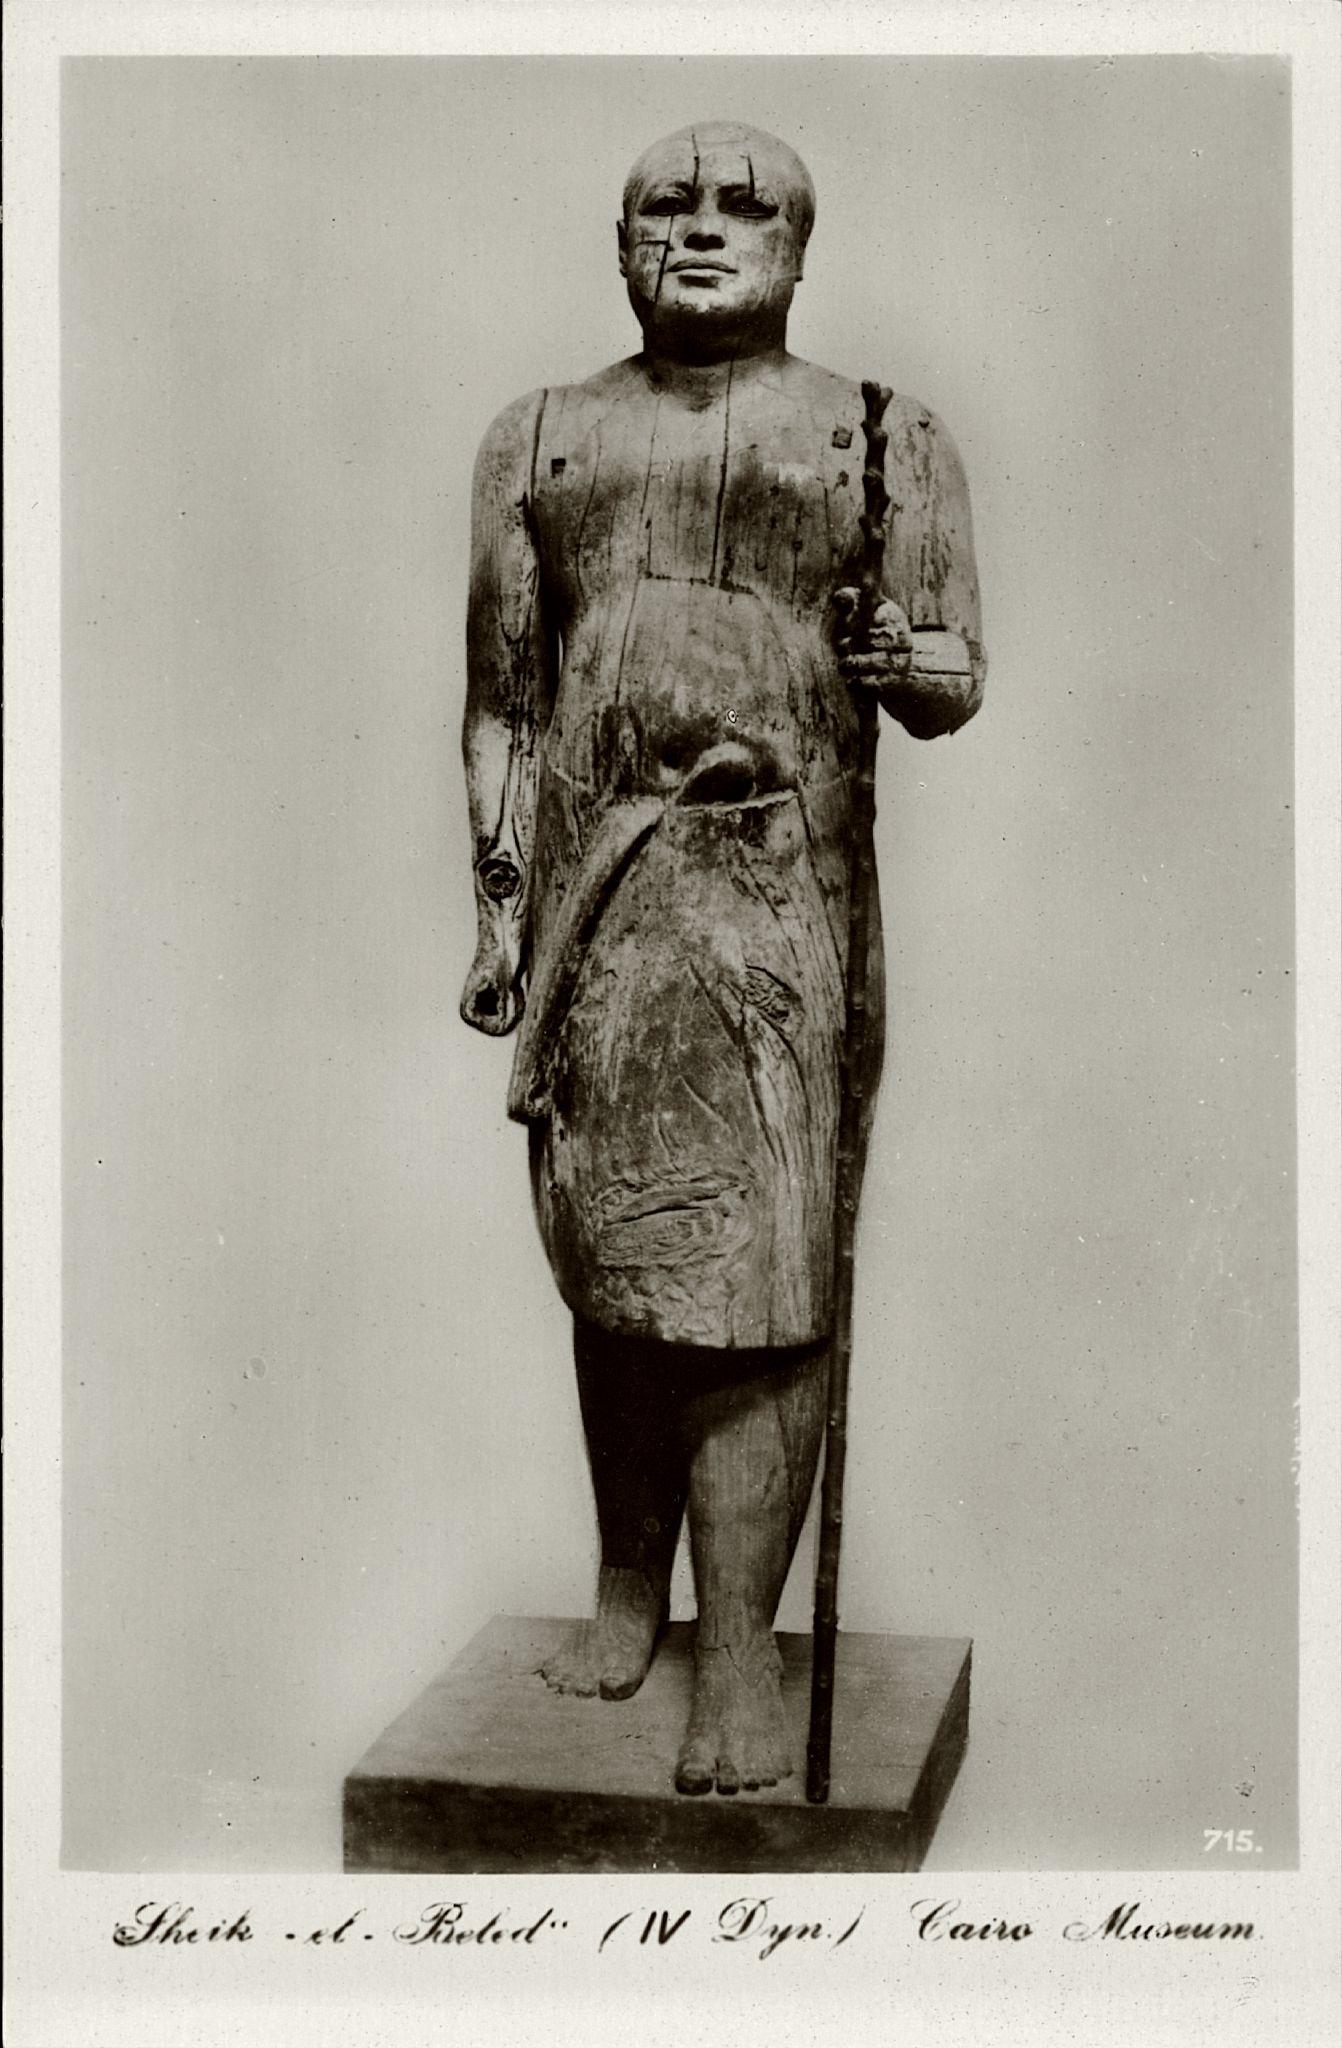 «Сельский староста» (статуя Ка-Апера — Шейх эль Беледа, IV династия)